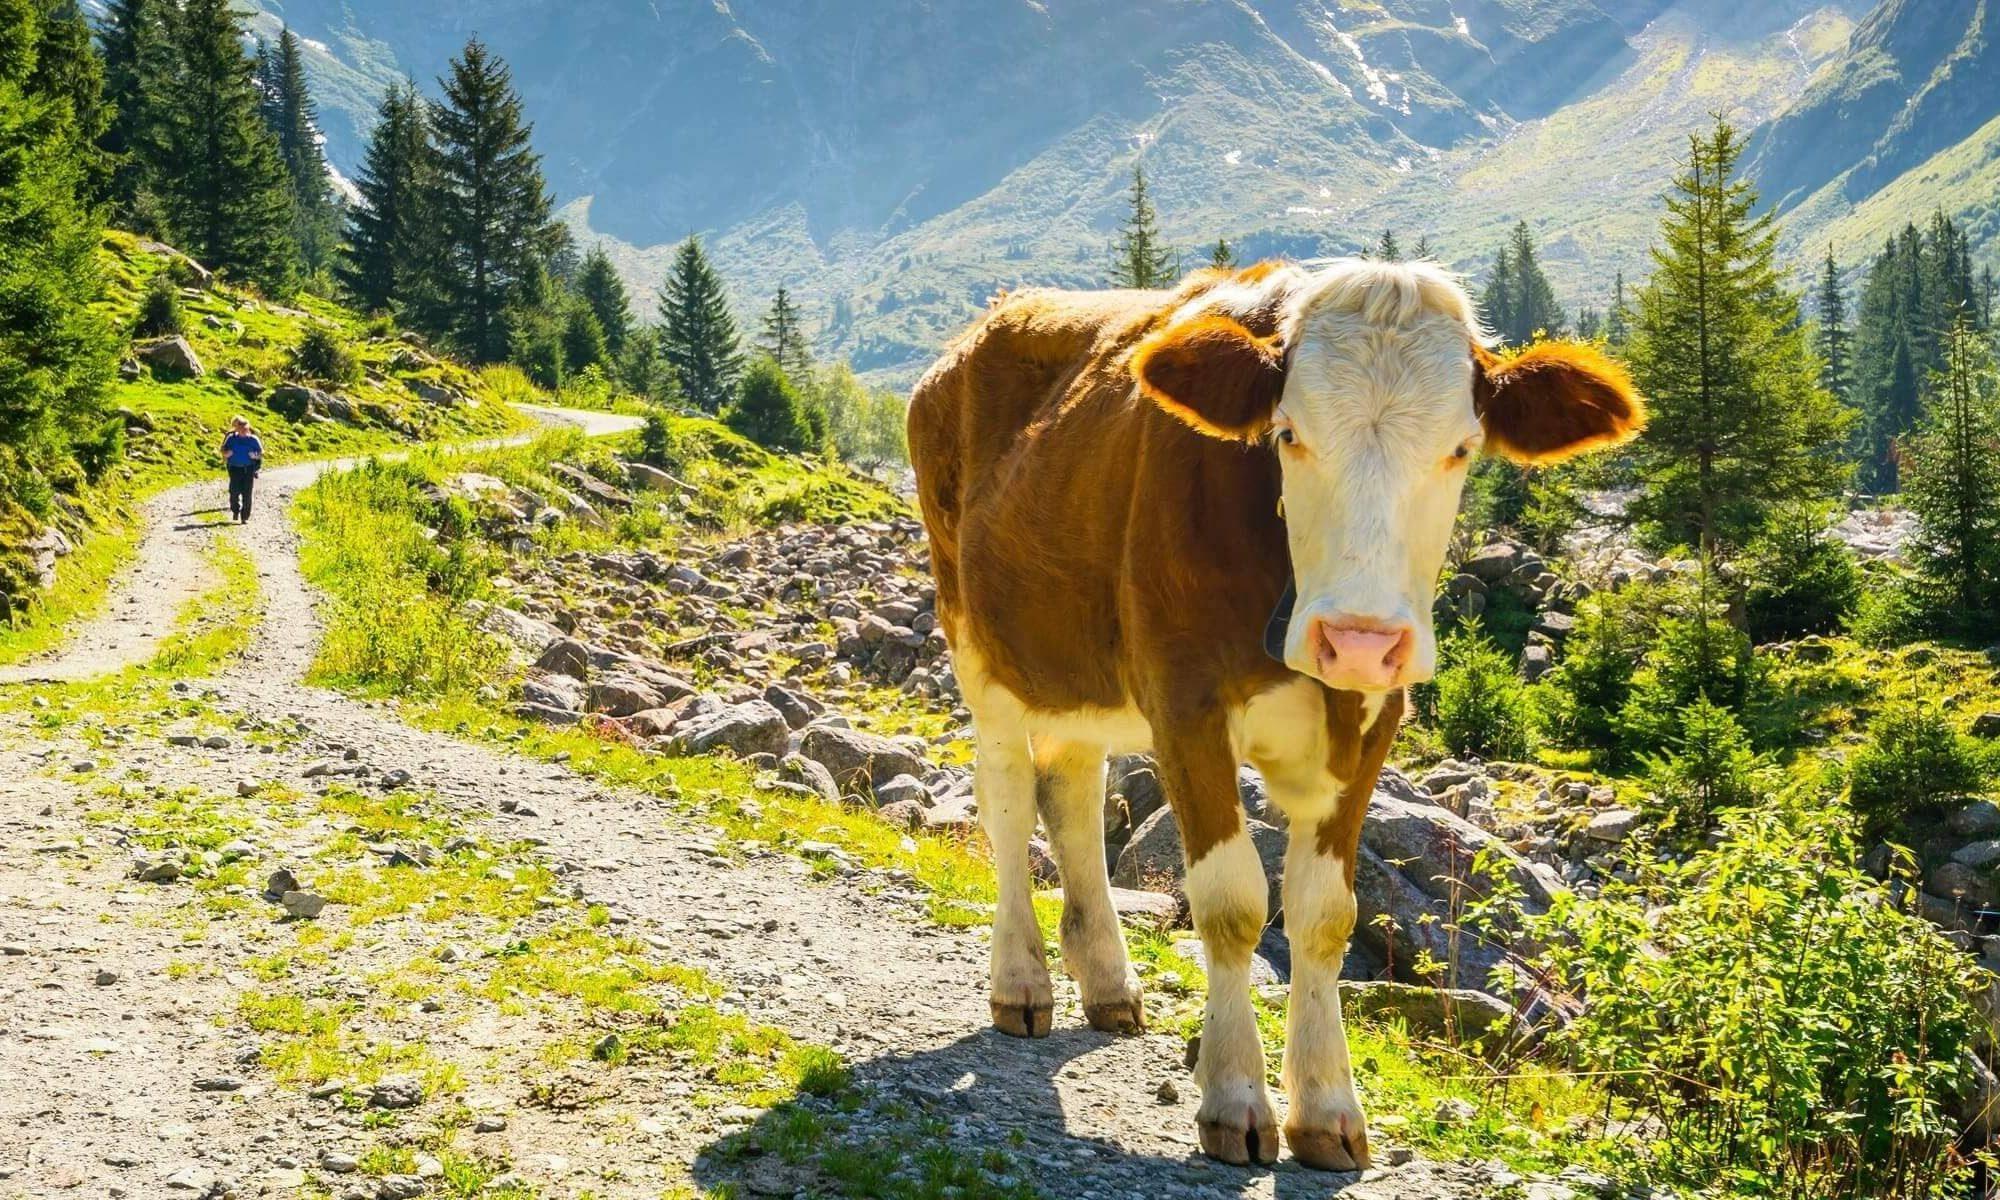 Singlereise nach Bad Leonfelden - Kuh auf Wanderweg